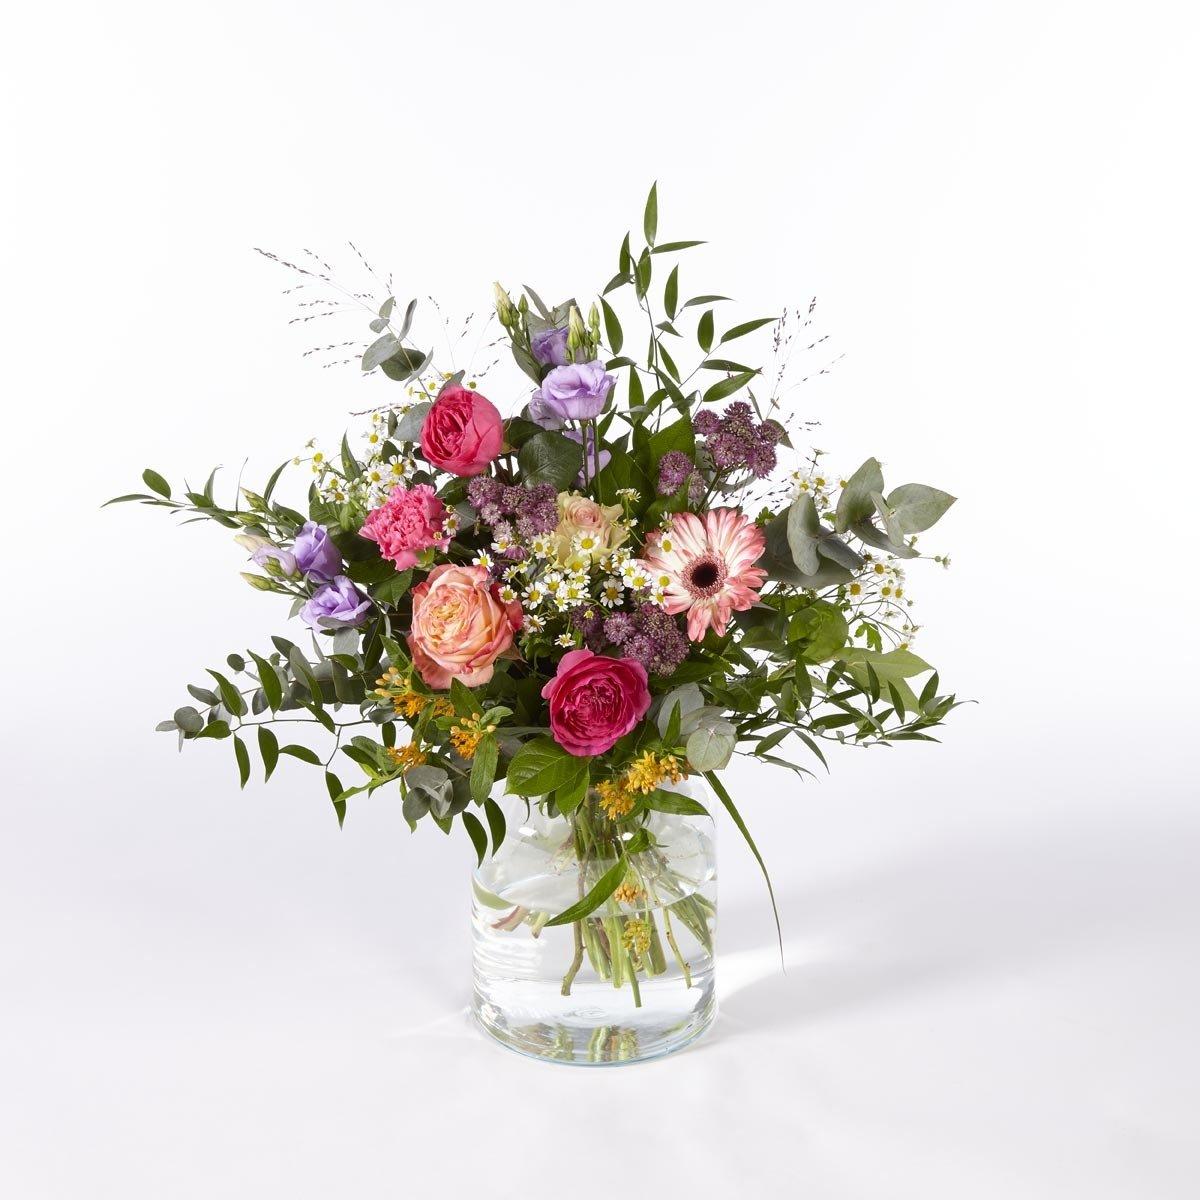 Bloemenpracht